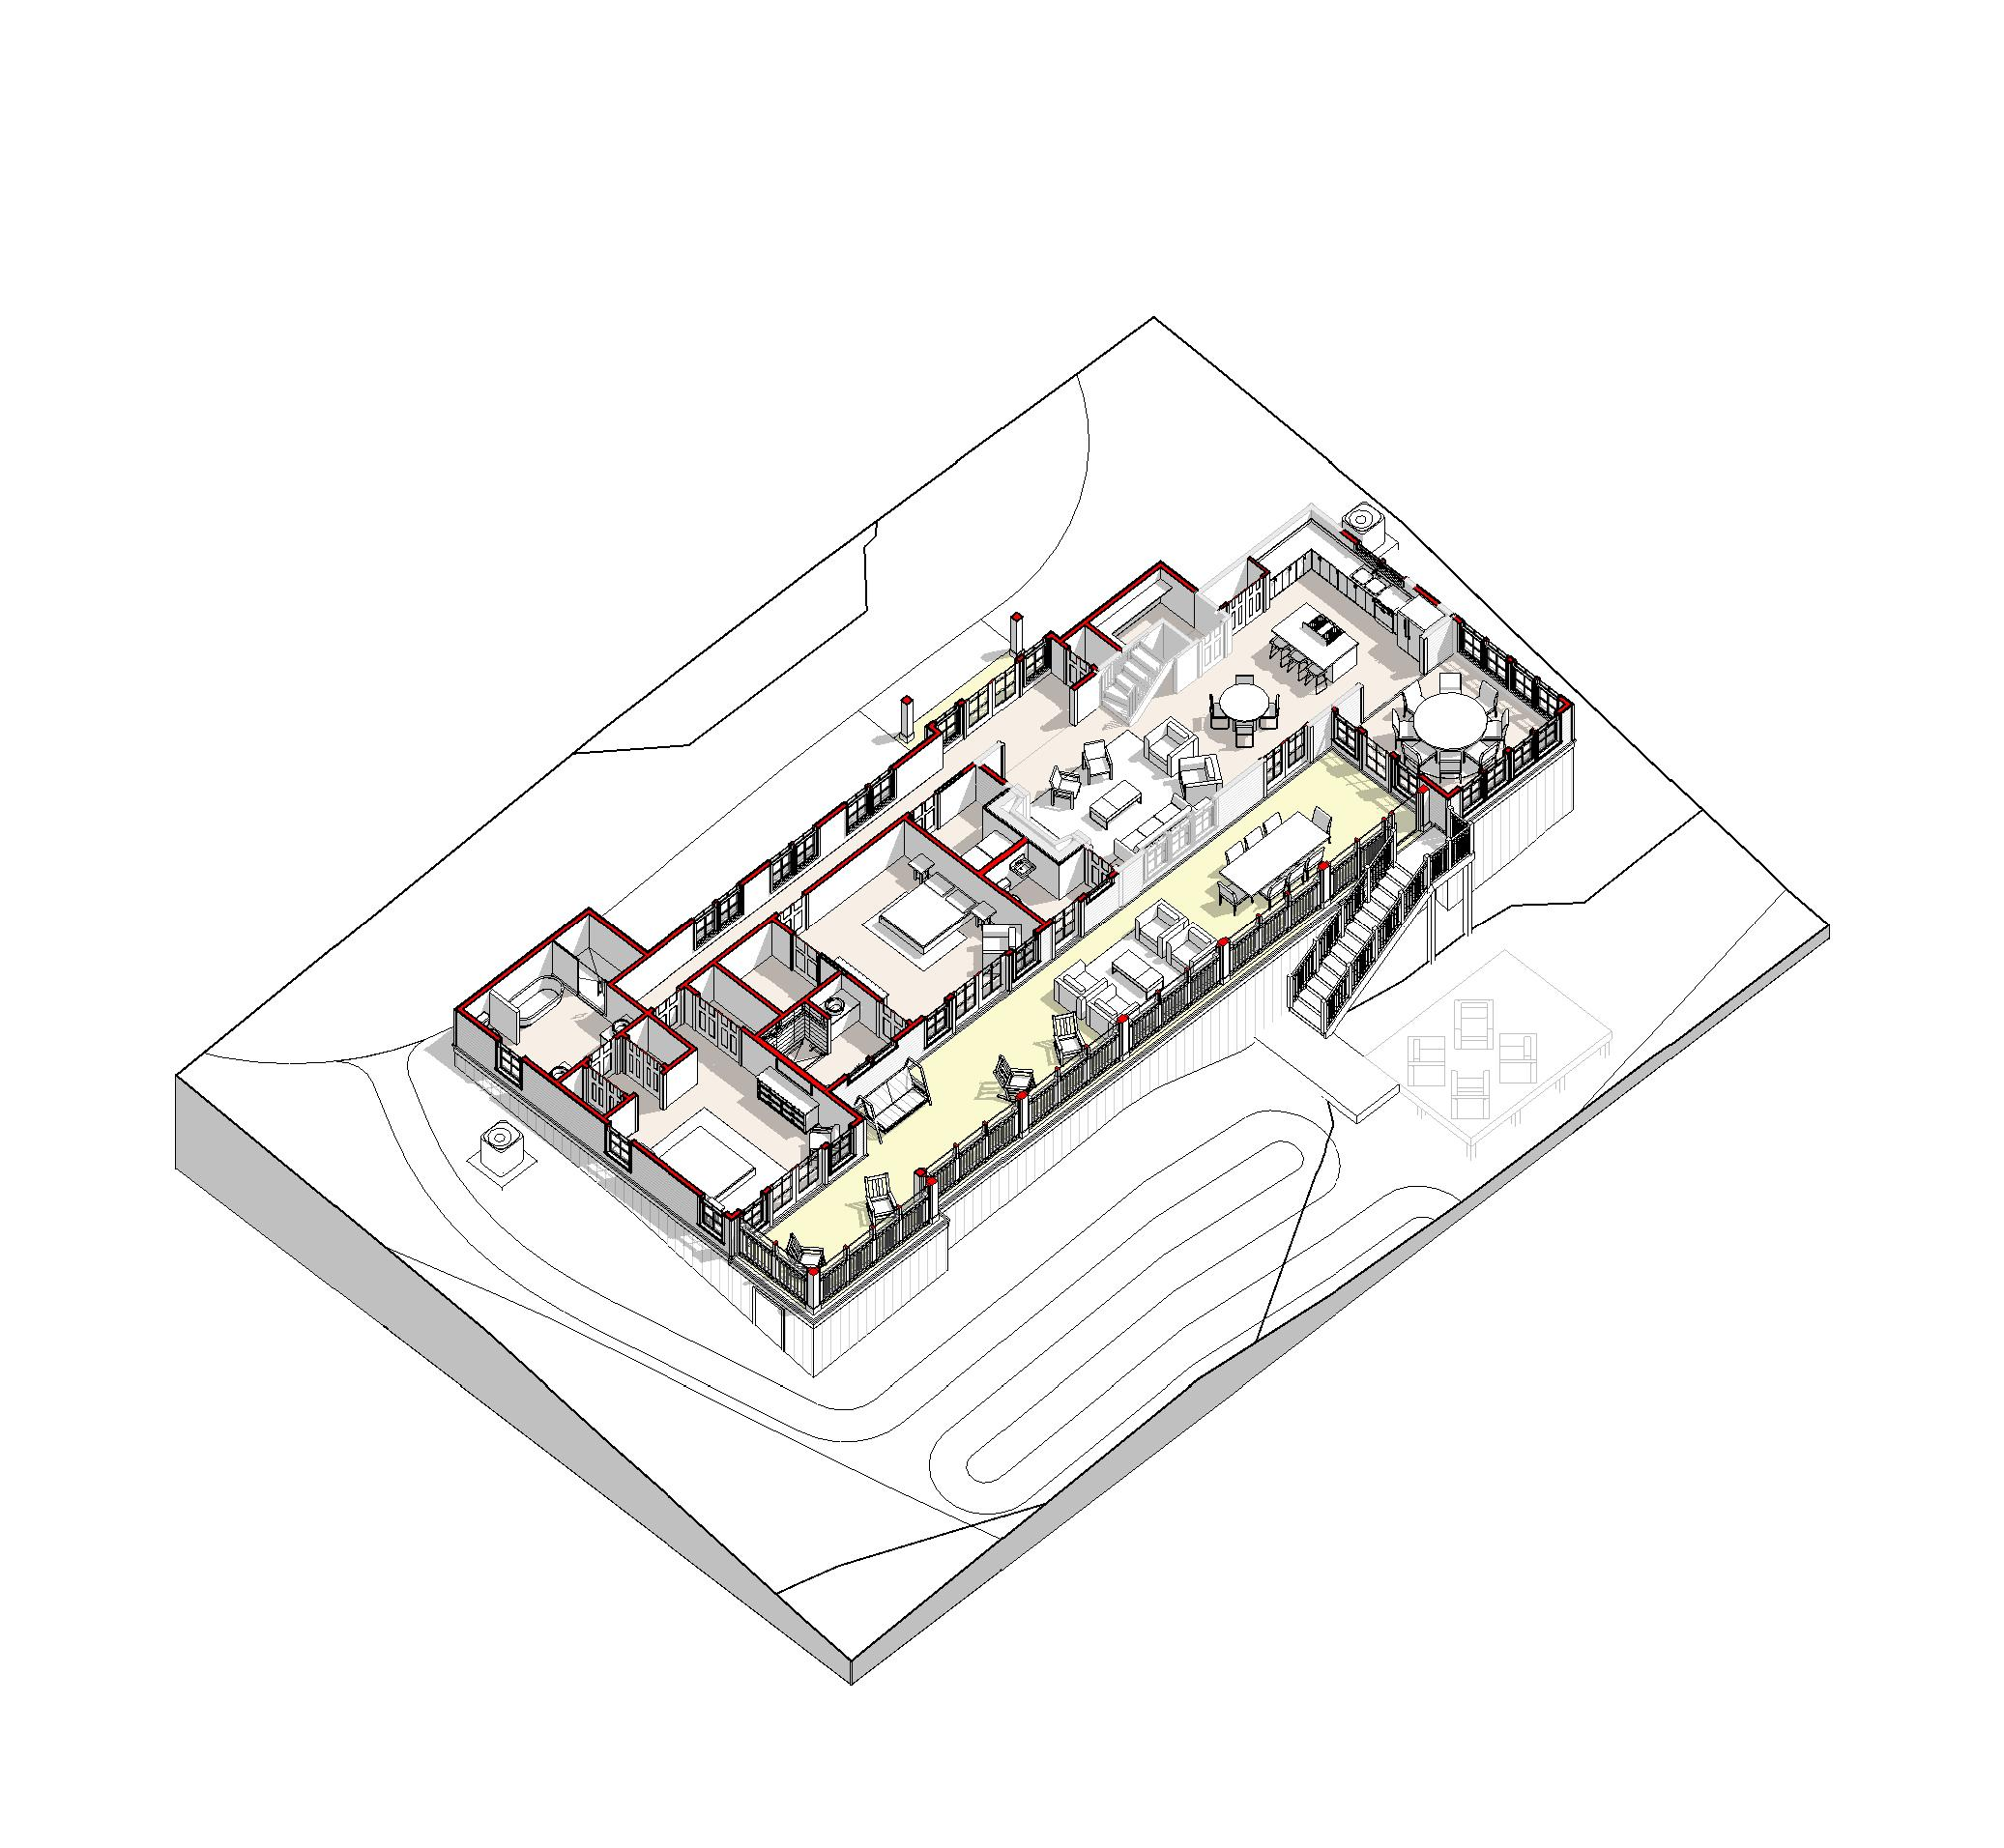 2031_ - 3D View - 3D Axon - NW